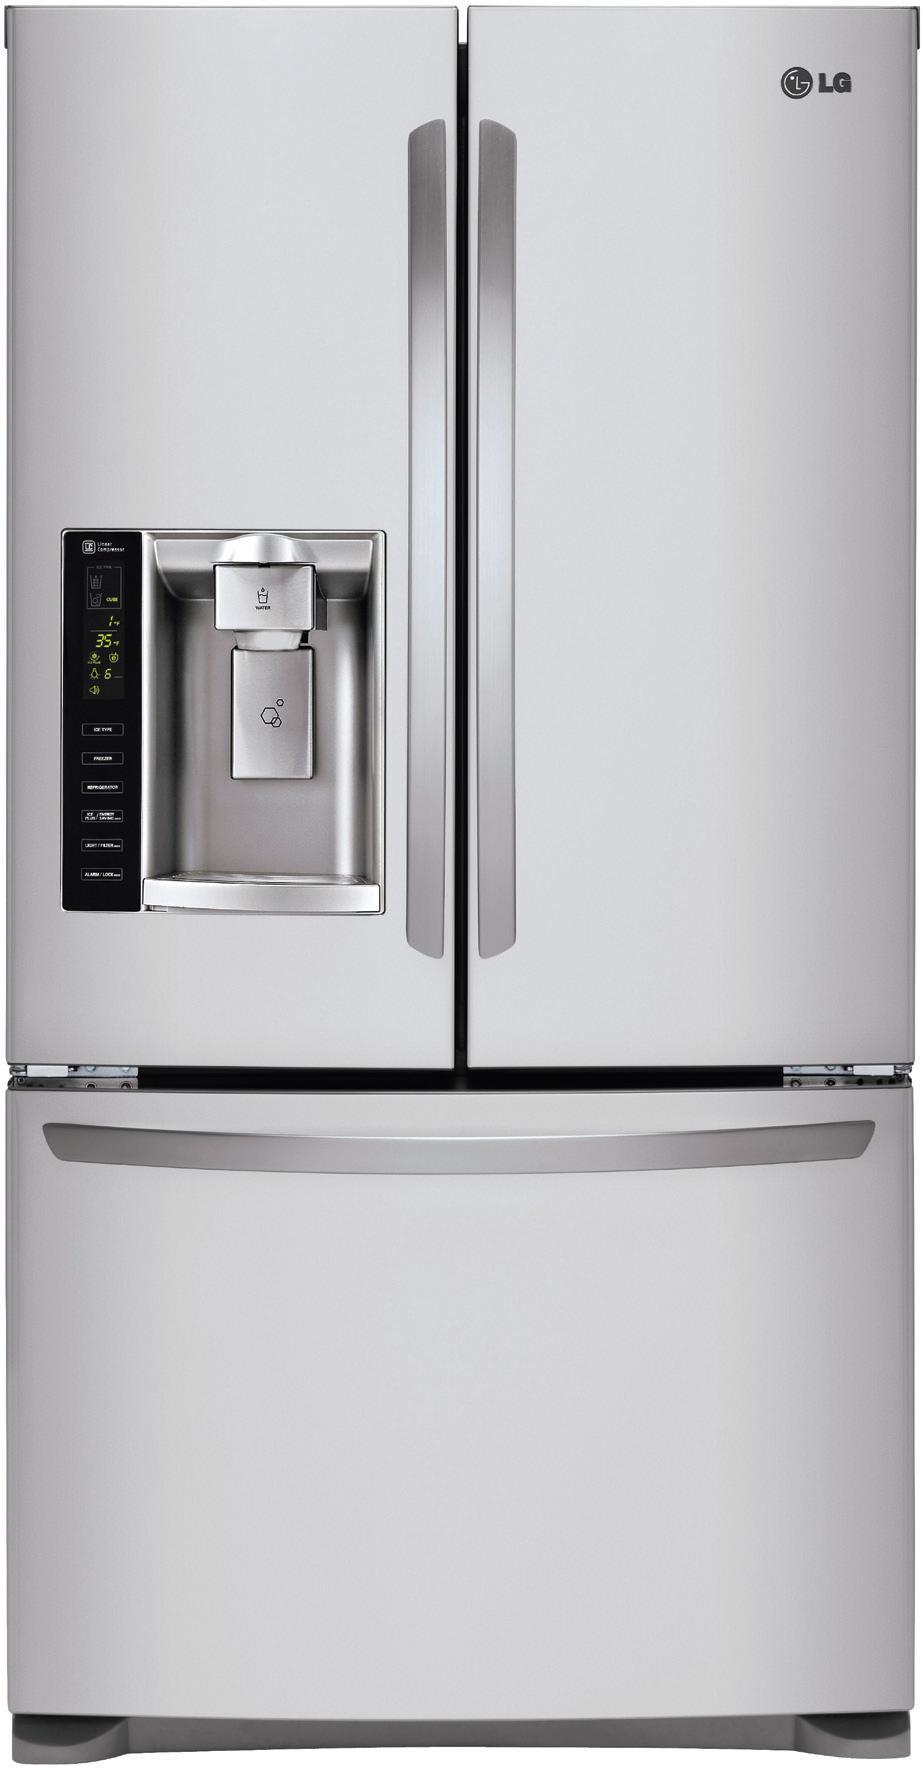 LG Appliances French Door Refrigerators 24.7 Cu. Ft. French Door Refrigerator - Item Number: LFX25974ST